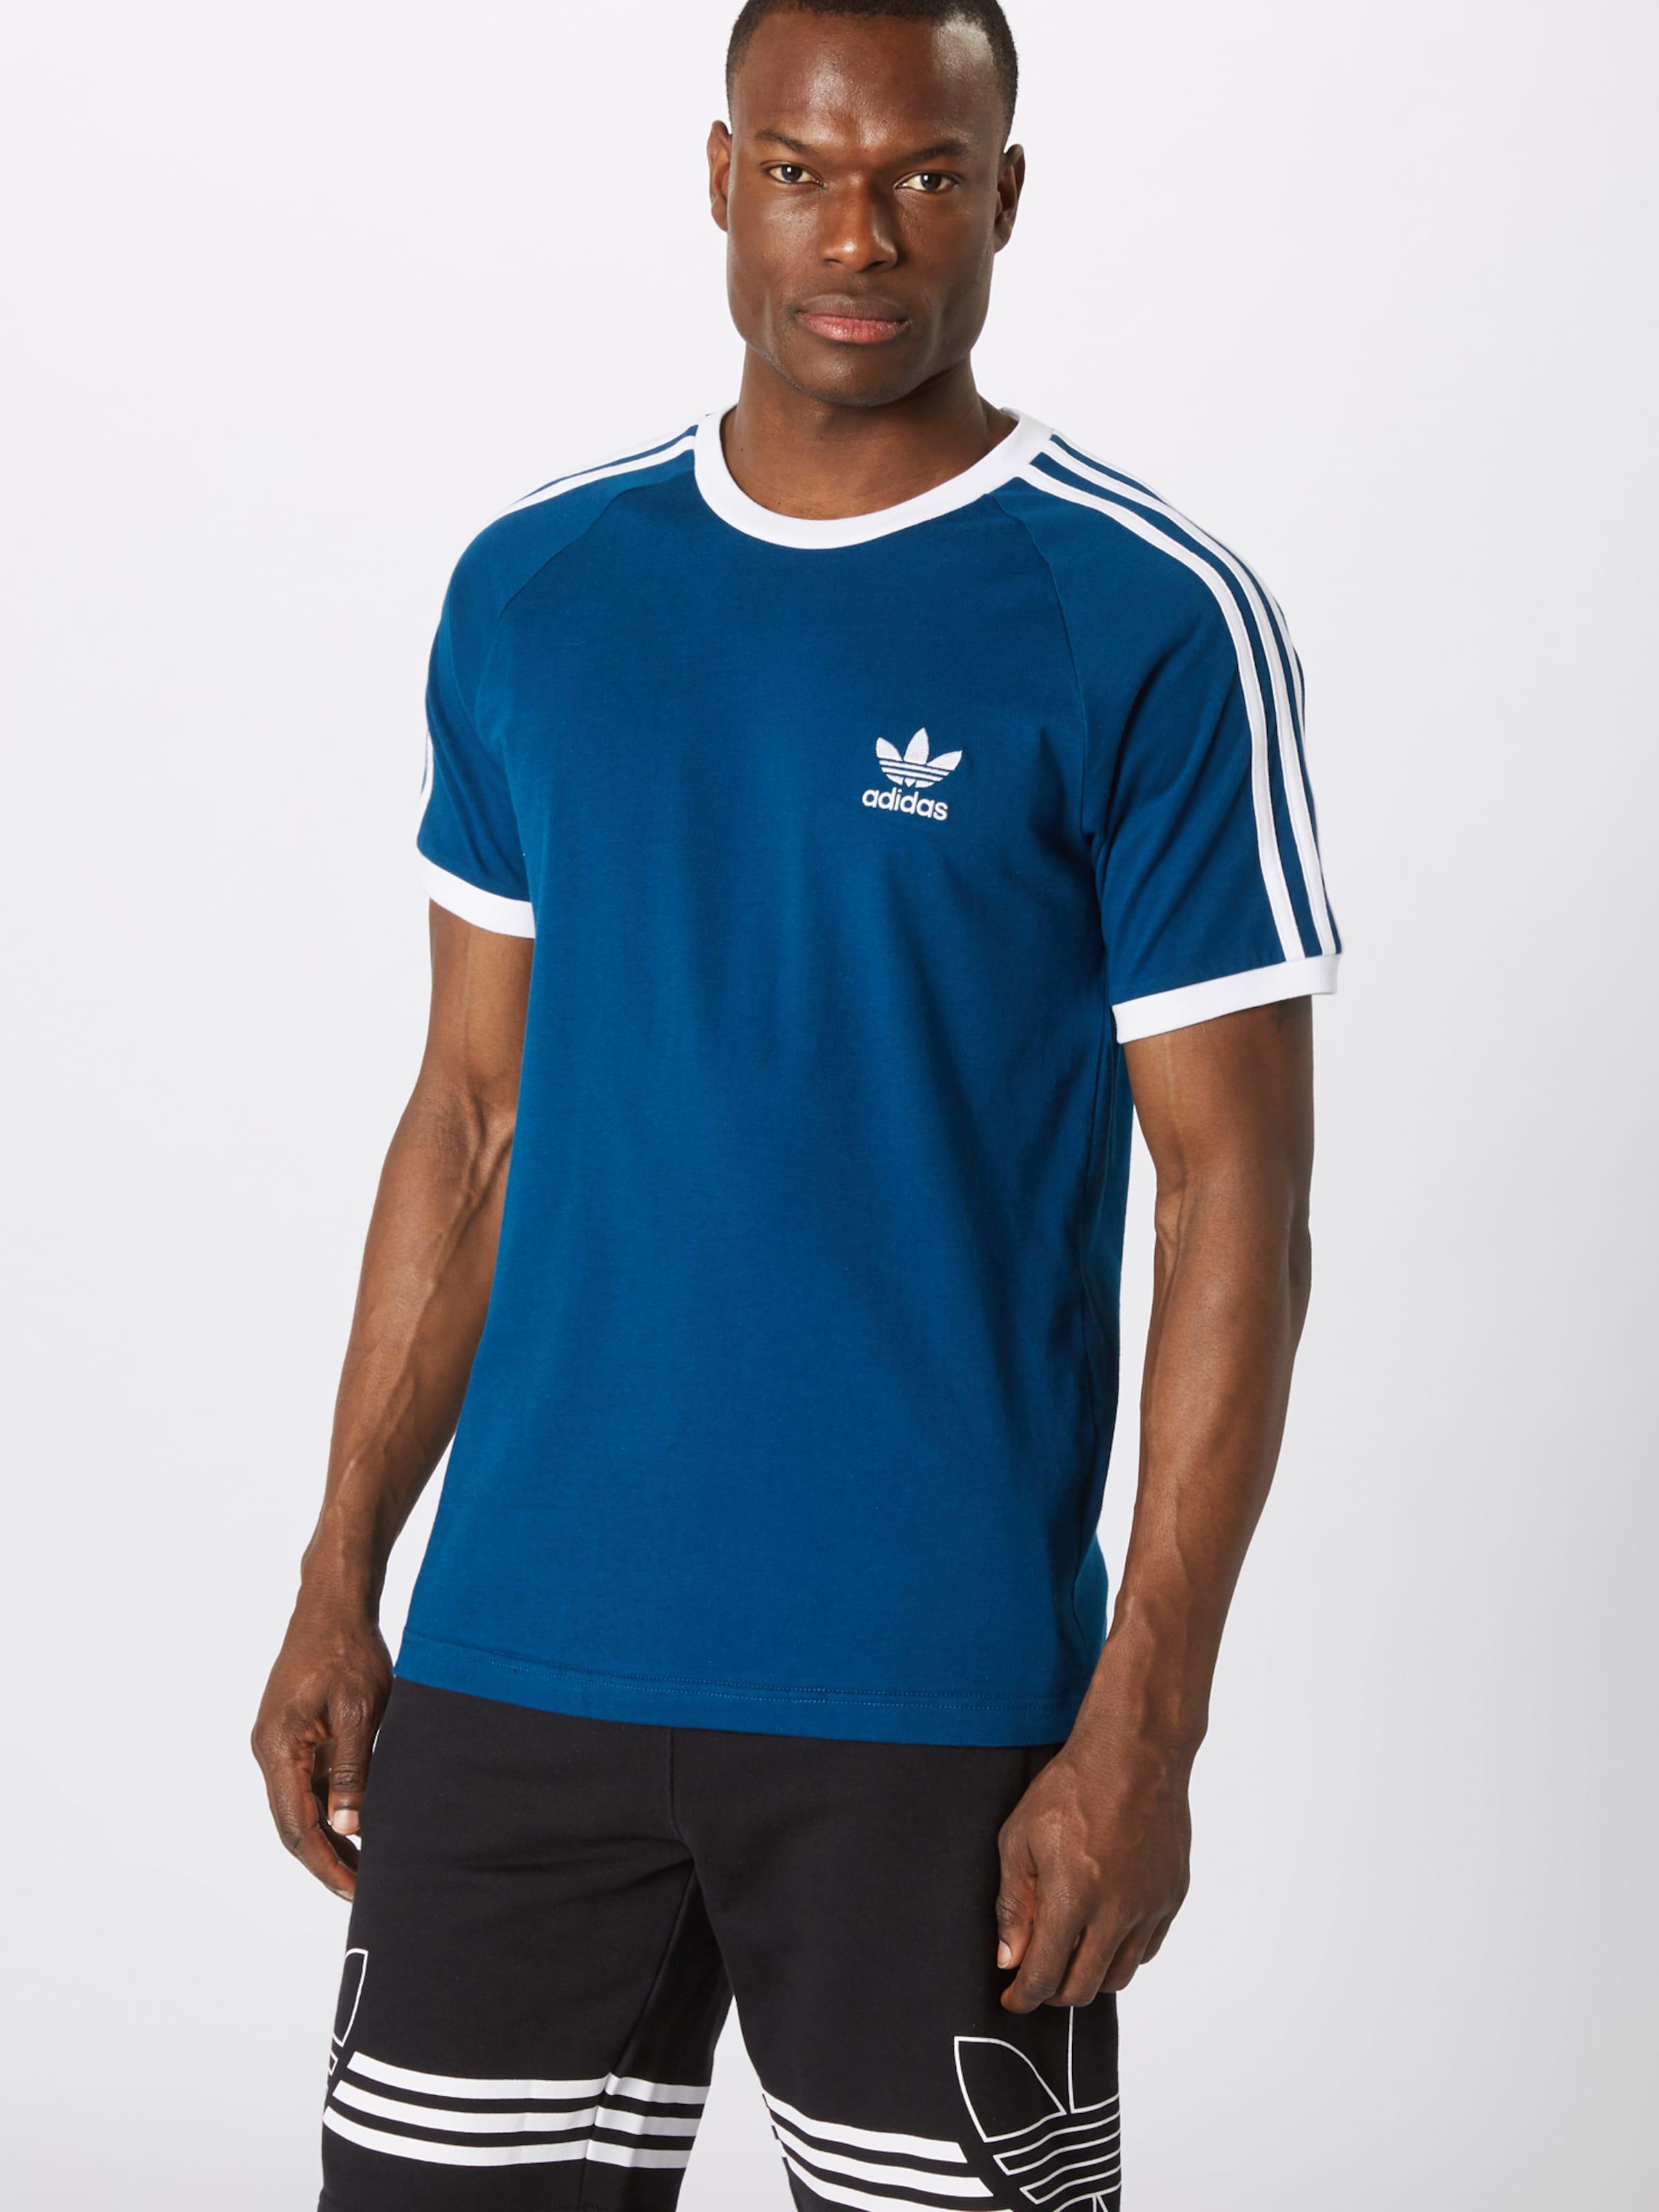 shirt T Originals '3 En stripes' Adidas BleuBlanc nN0k8wOPX